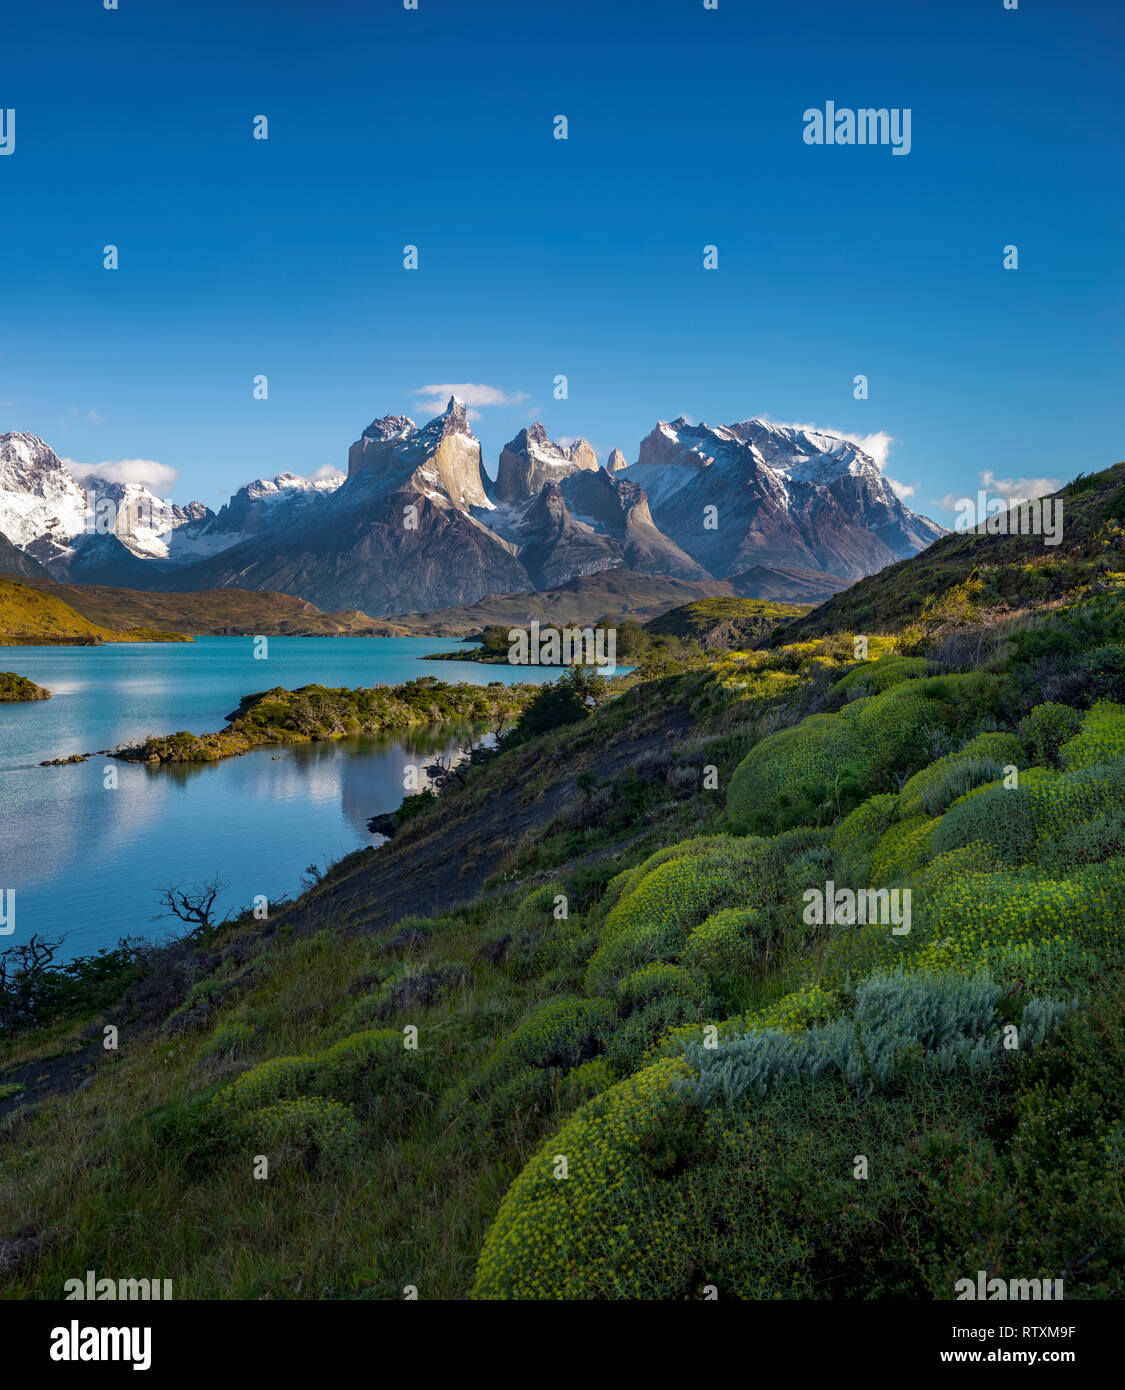 The Torres del Paine above Lago Nordenskjold. - Stock Image